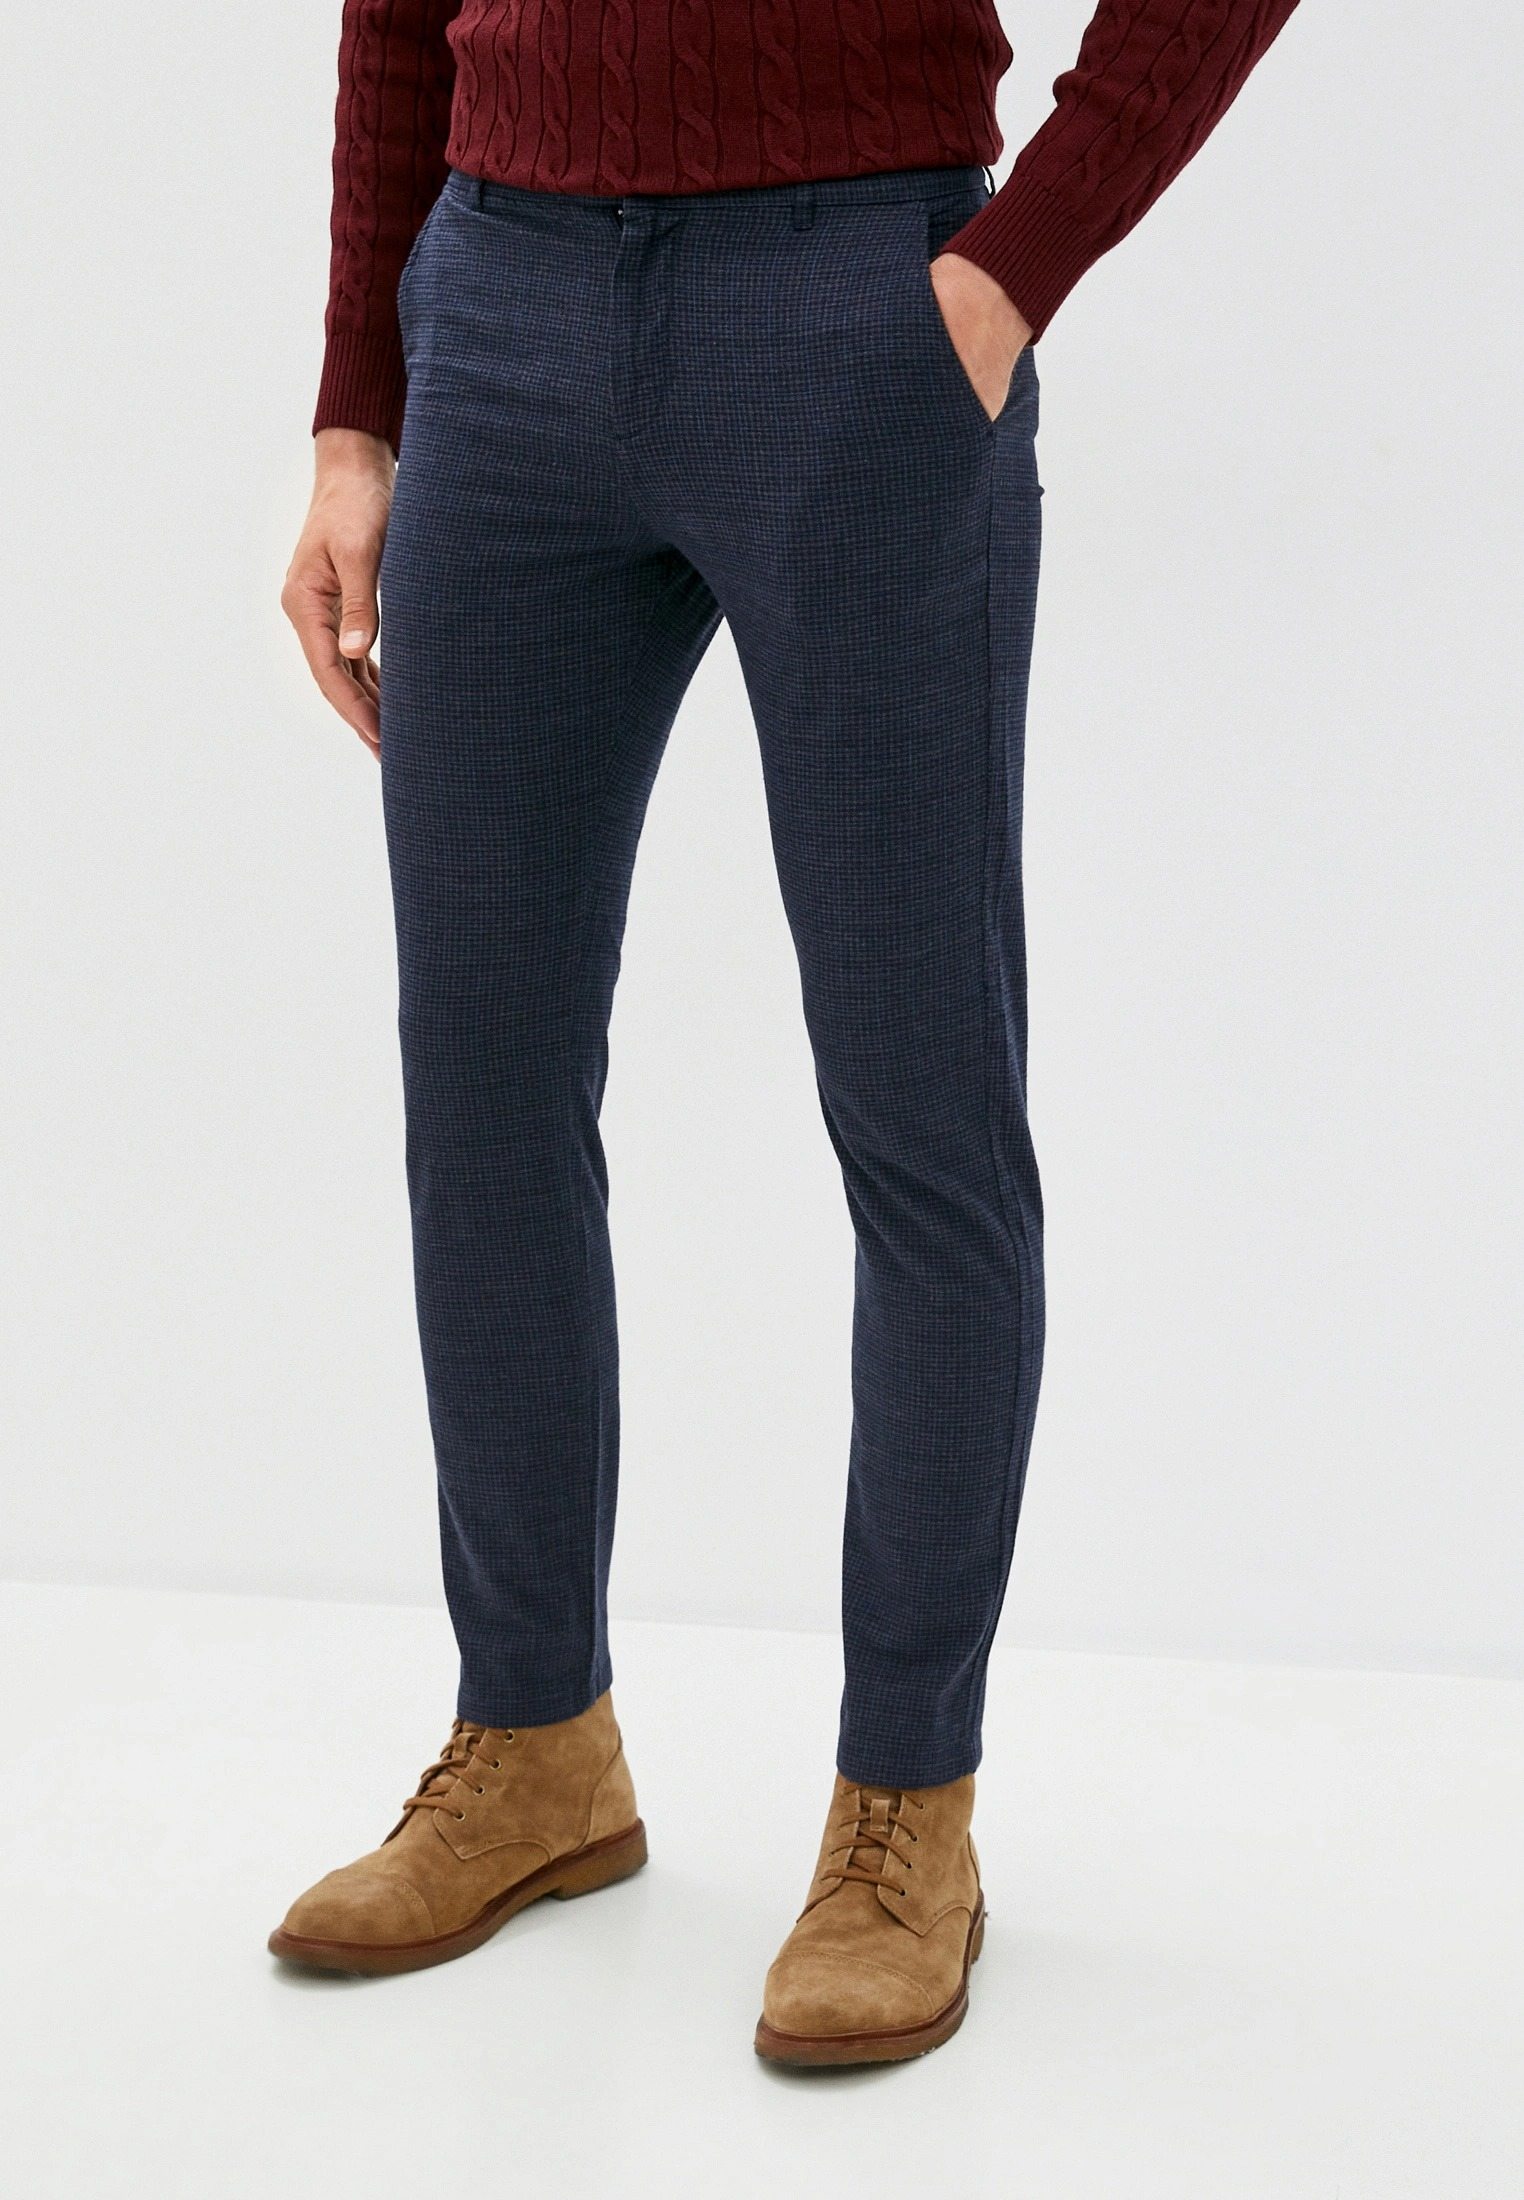 Pantaloni Selected Casual (4585) photo